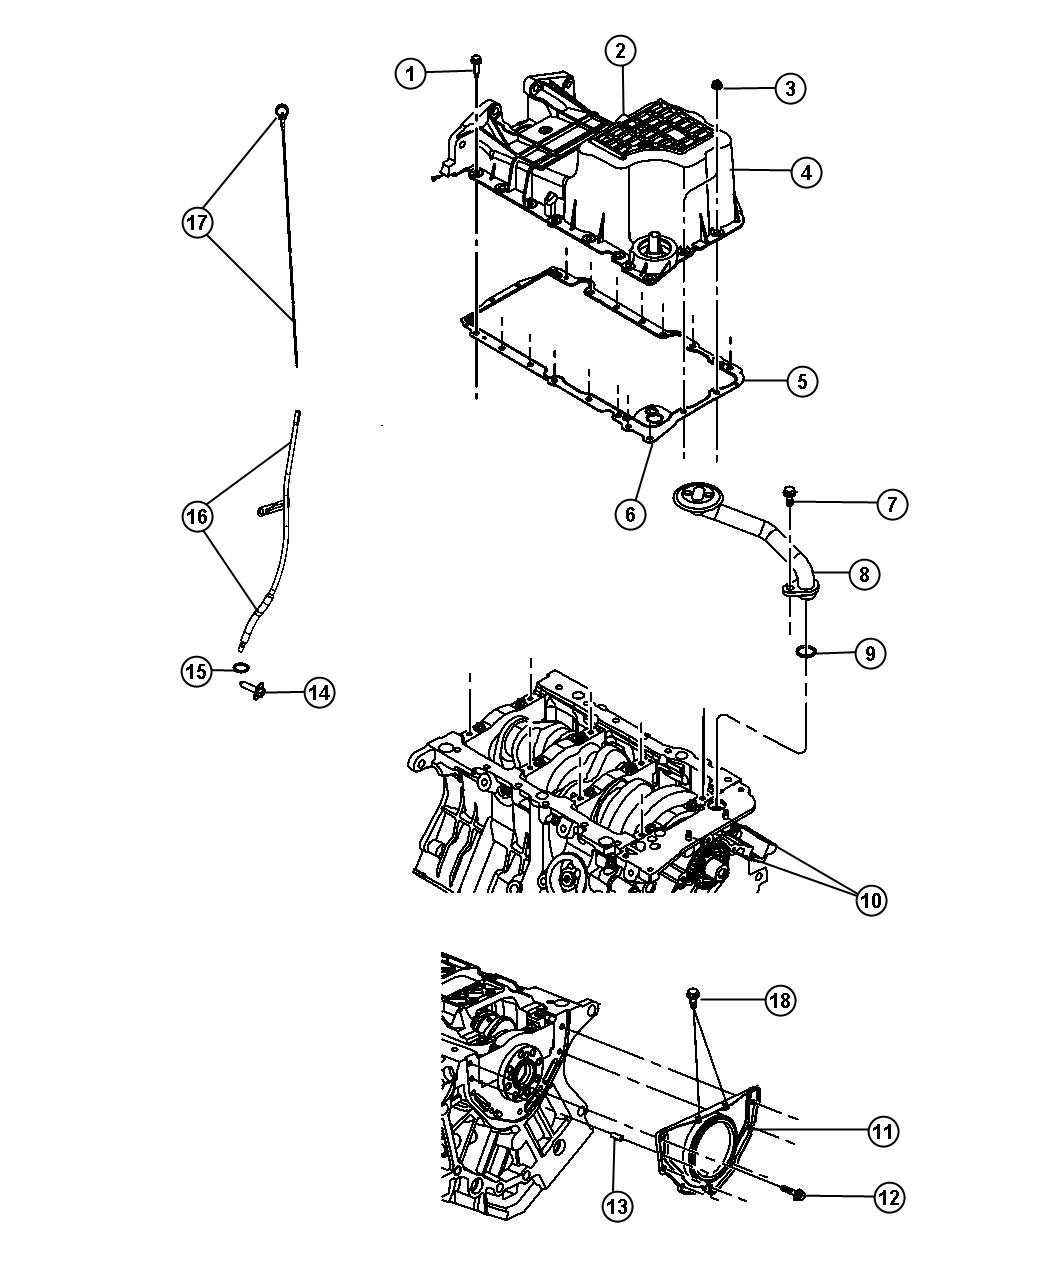 2010 dodge caravan coolant leak | wiring diagram database on 2007 dodge  nitro ac diagram,